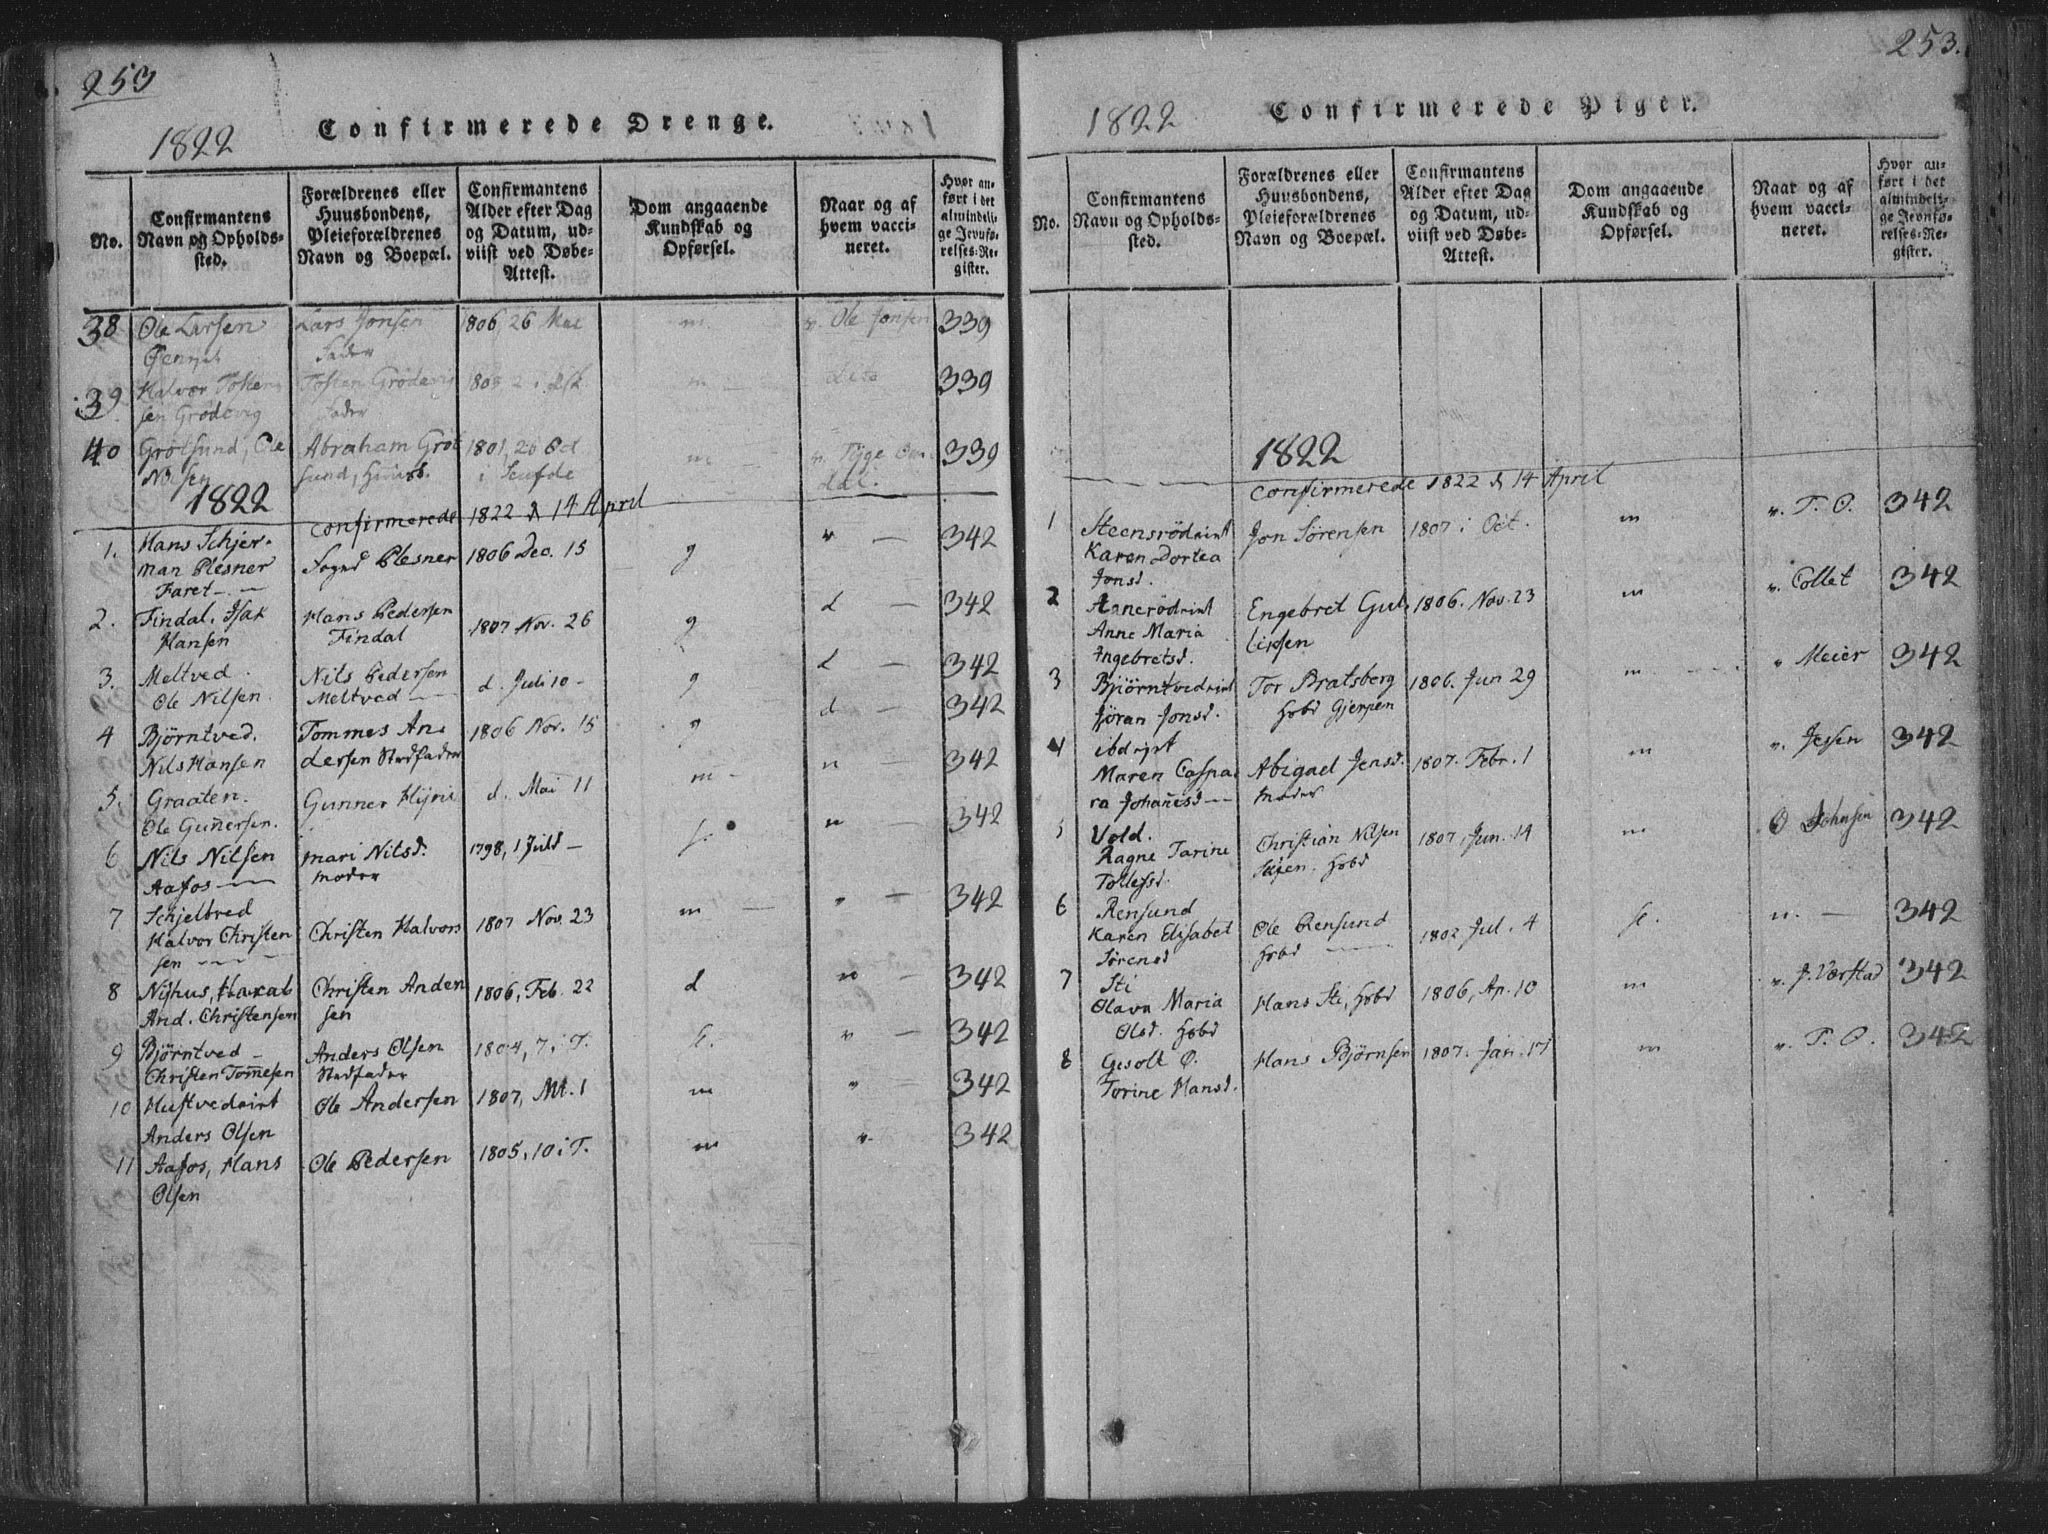 SAKO, Solum kirkebøker, F/Fa/L0004: Ministerialbok nr. I 4, 1814-1833, s. 253